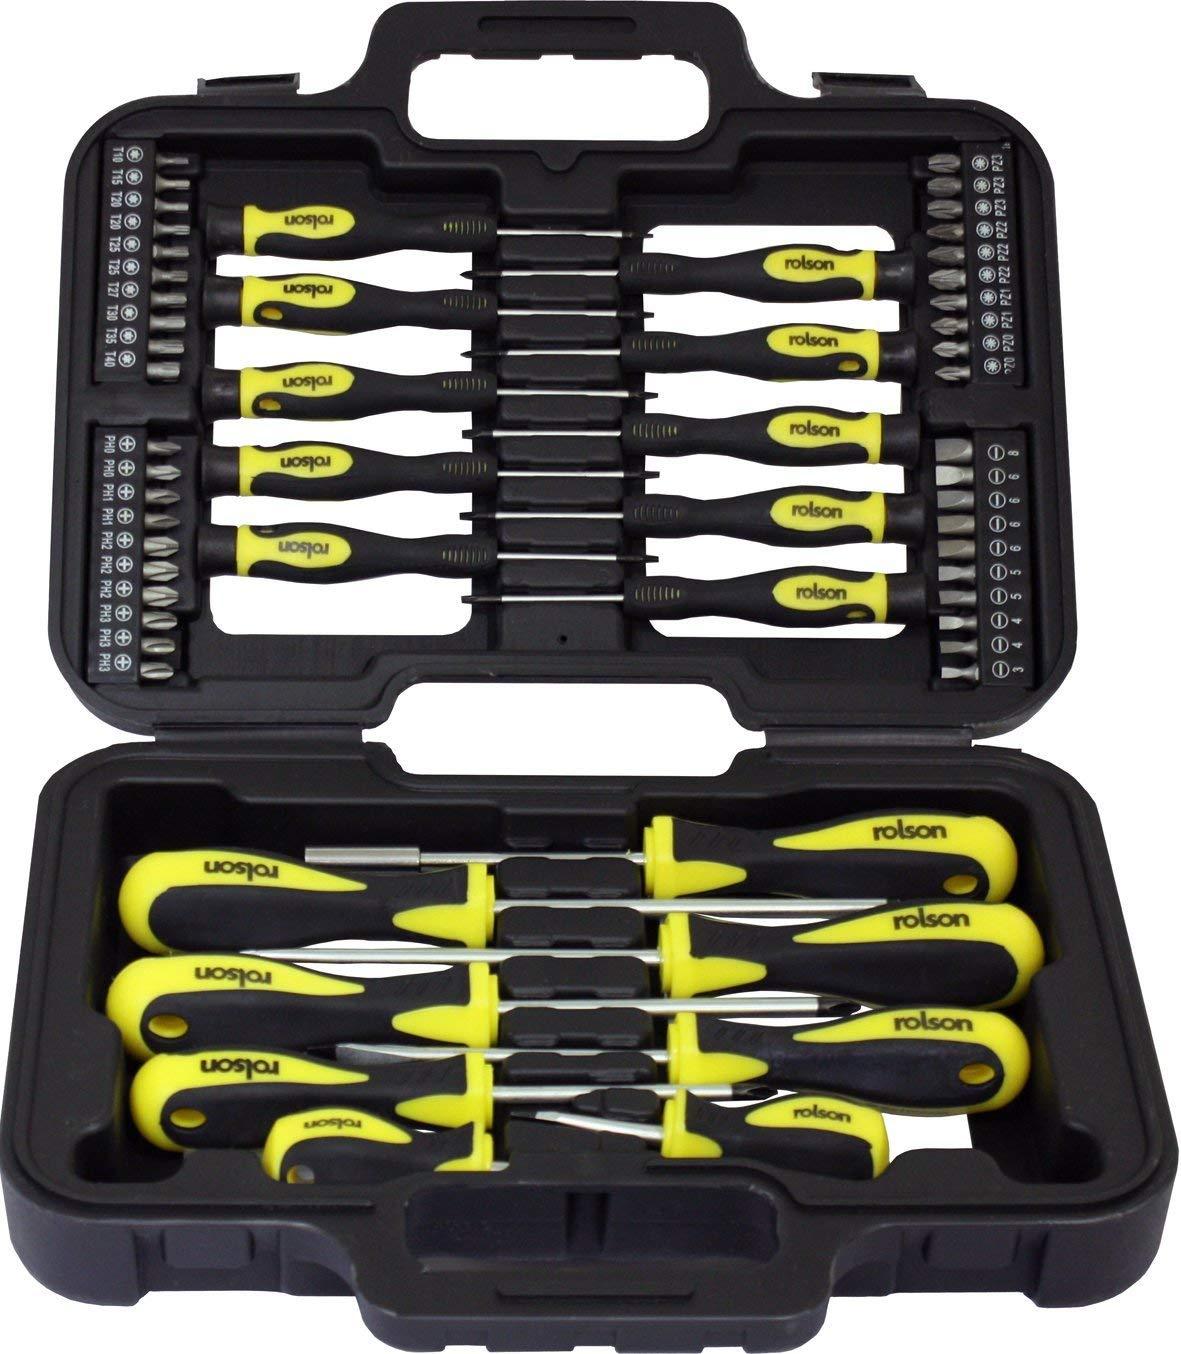 Rolson 28882 Screwdriver Set - 58 Pieces - was £15.49 now £9.99 (Prime) / £14.48 (Non-Prime)  @ Amazon